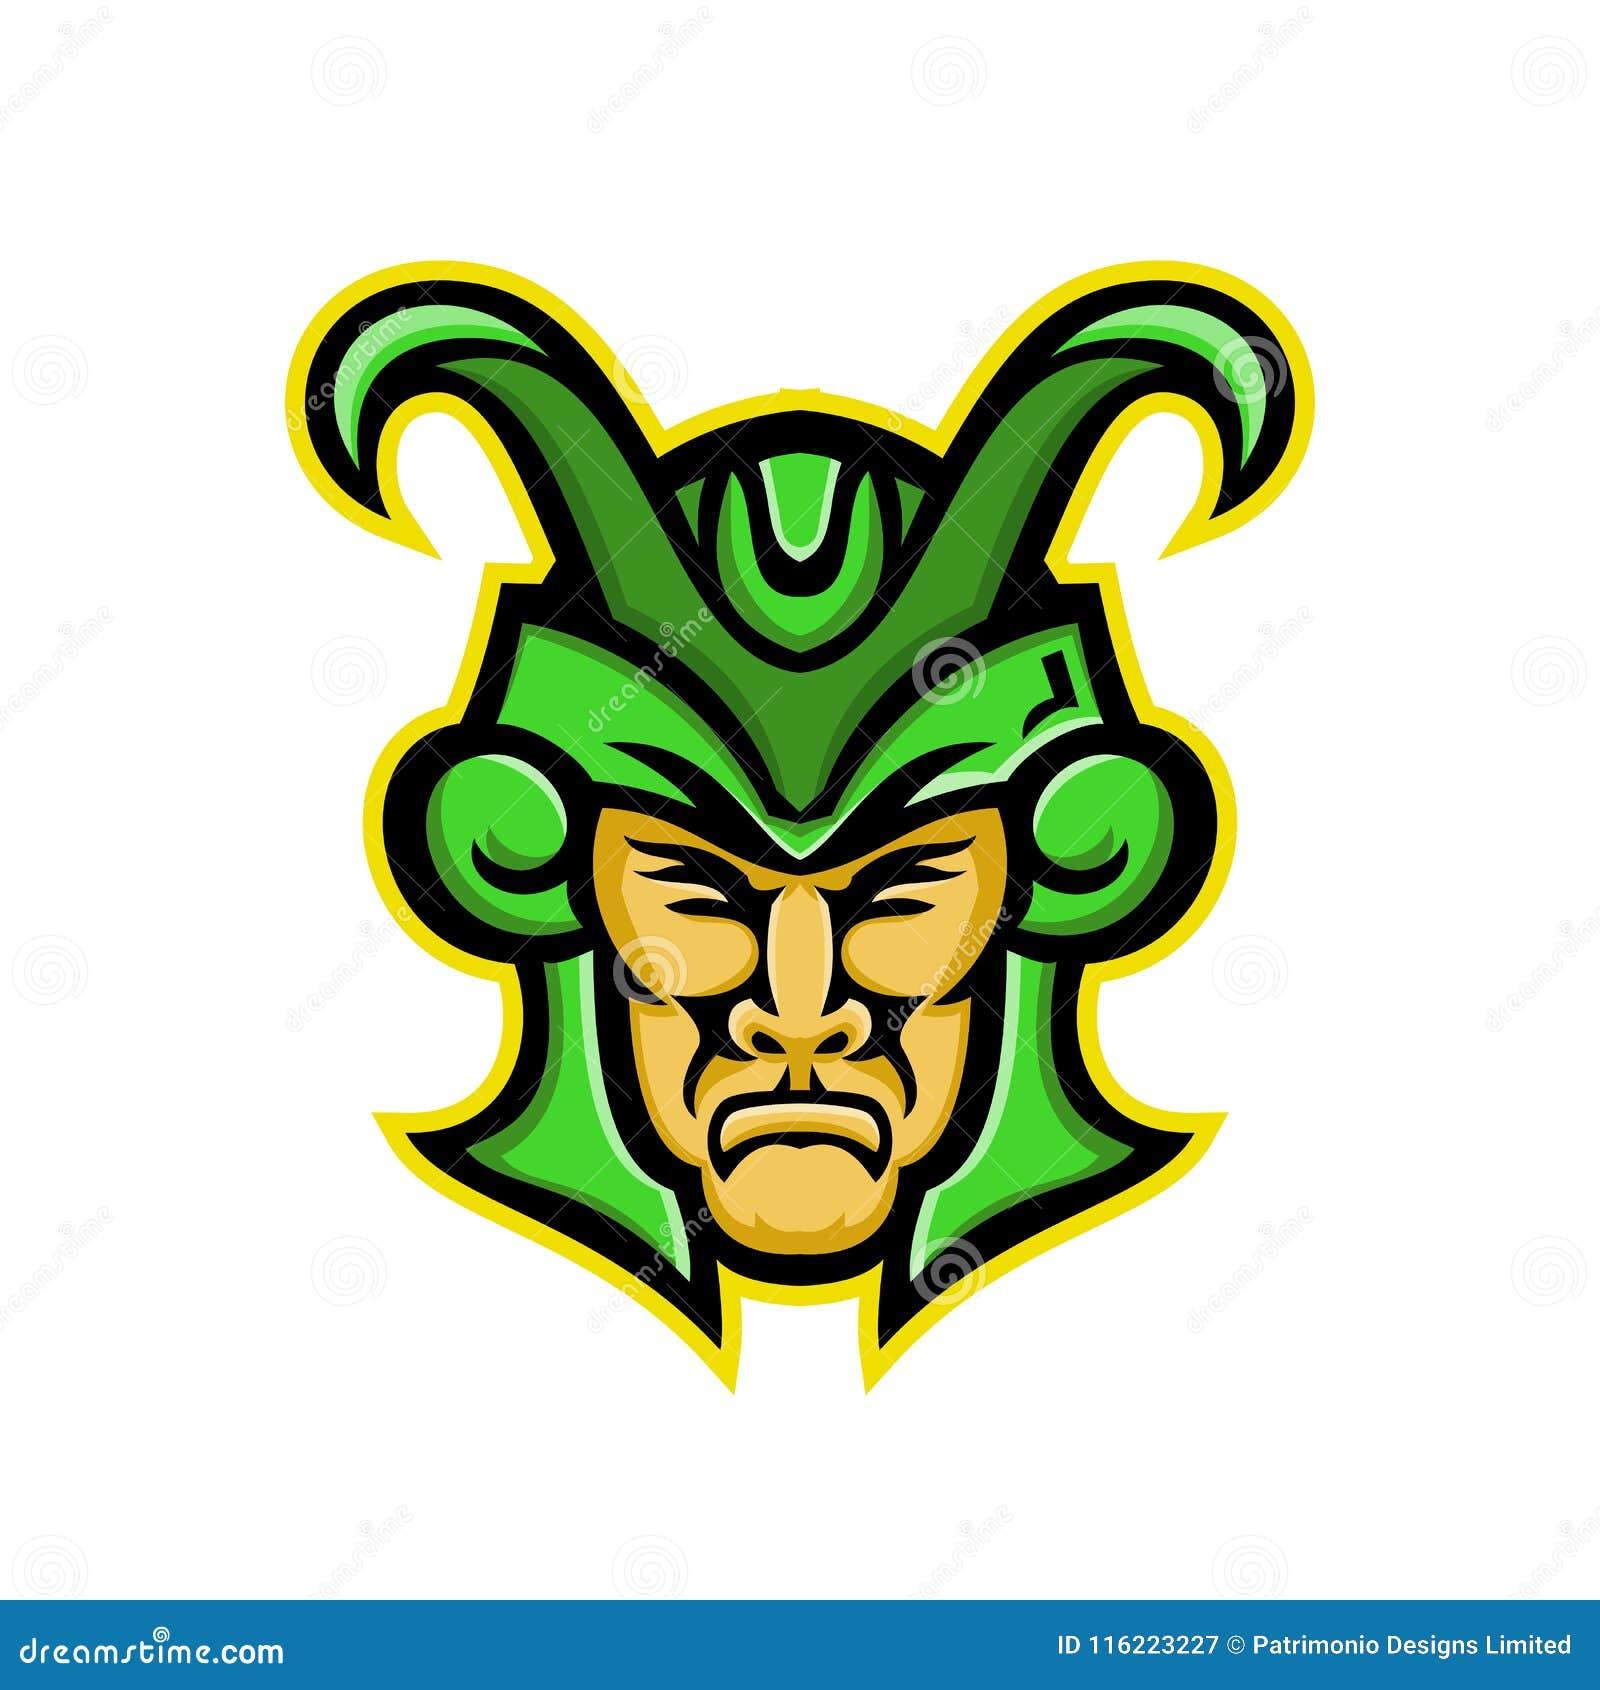 Loki Norse God Mascot Stock Vector Illustration Of Symbol 116223227